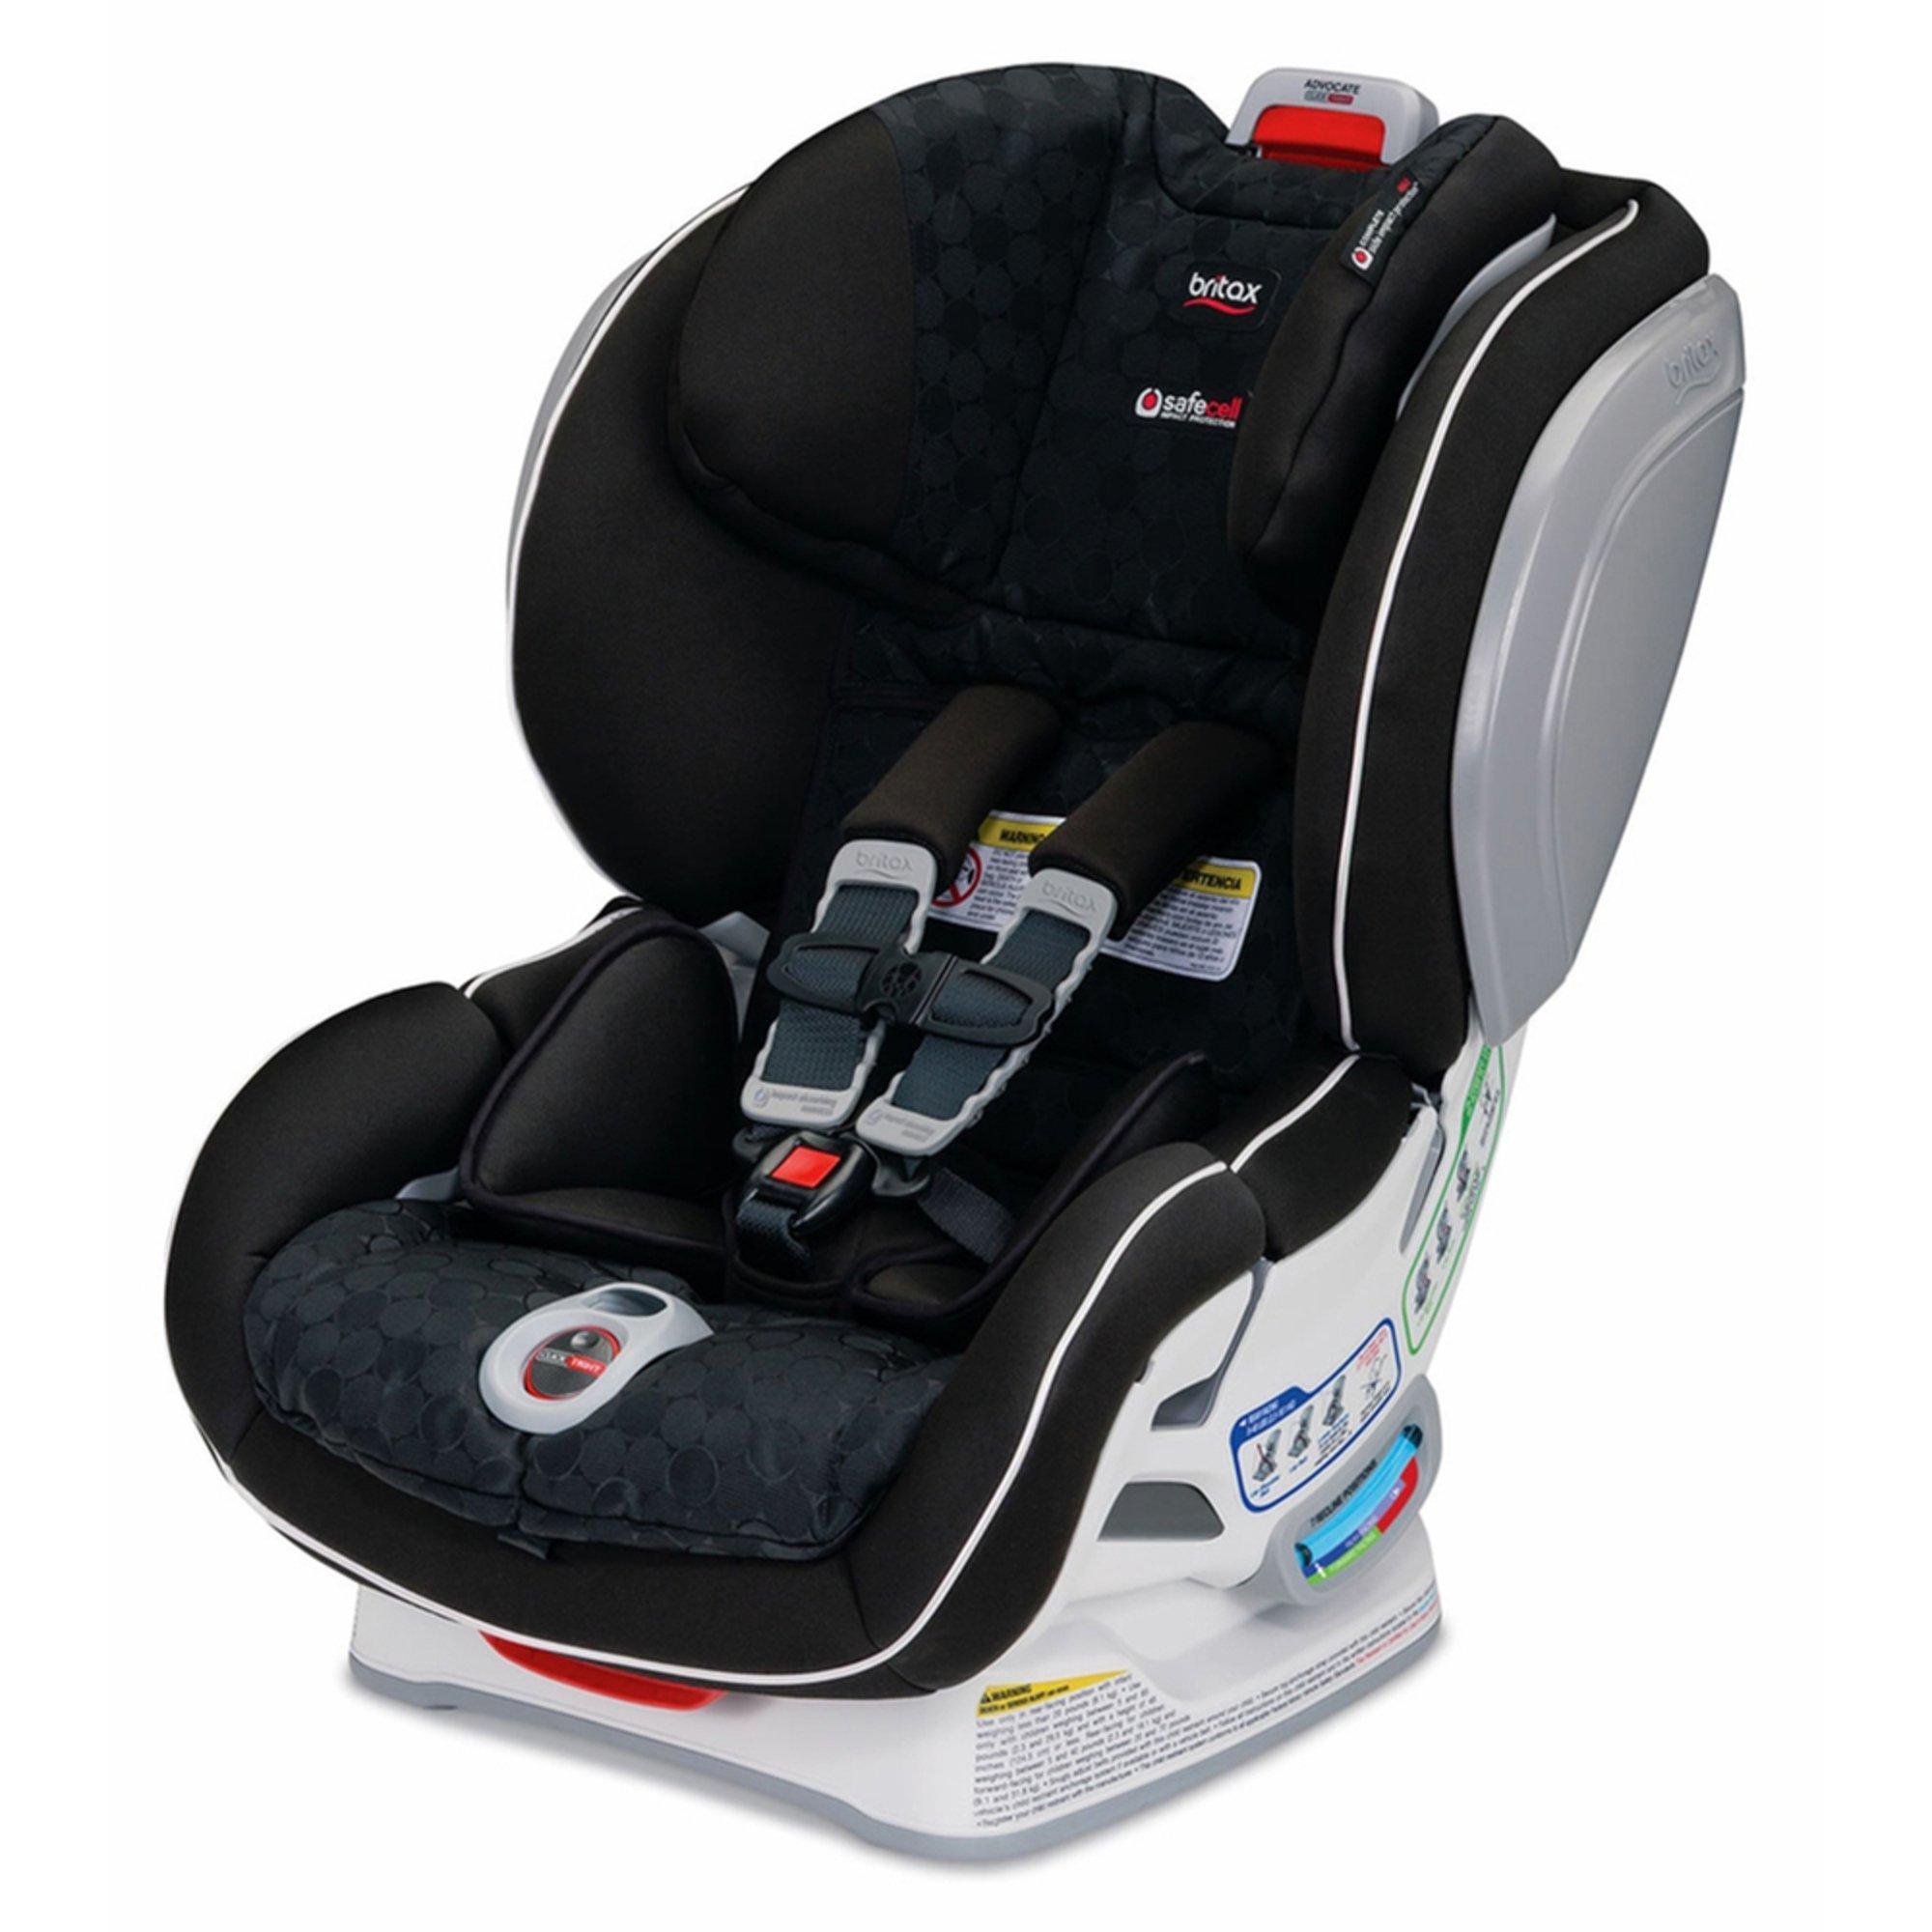 britax advocate clicktight circa convertible car seats kids shop your navy exchange. Black Bedroom Furniture Sets. Home Design Ideas